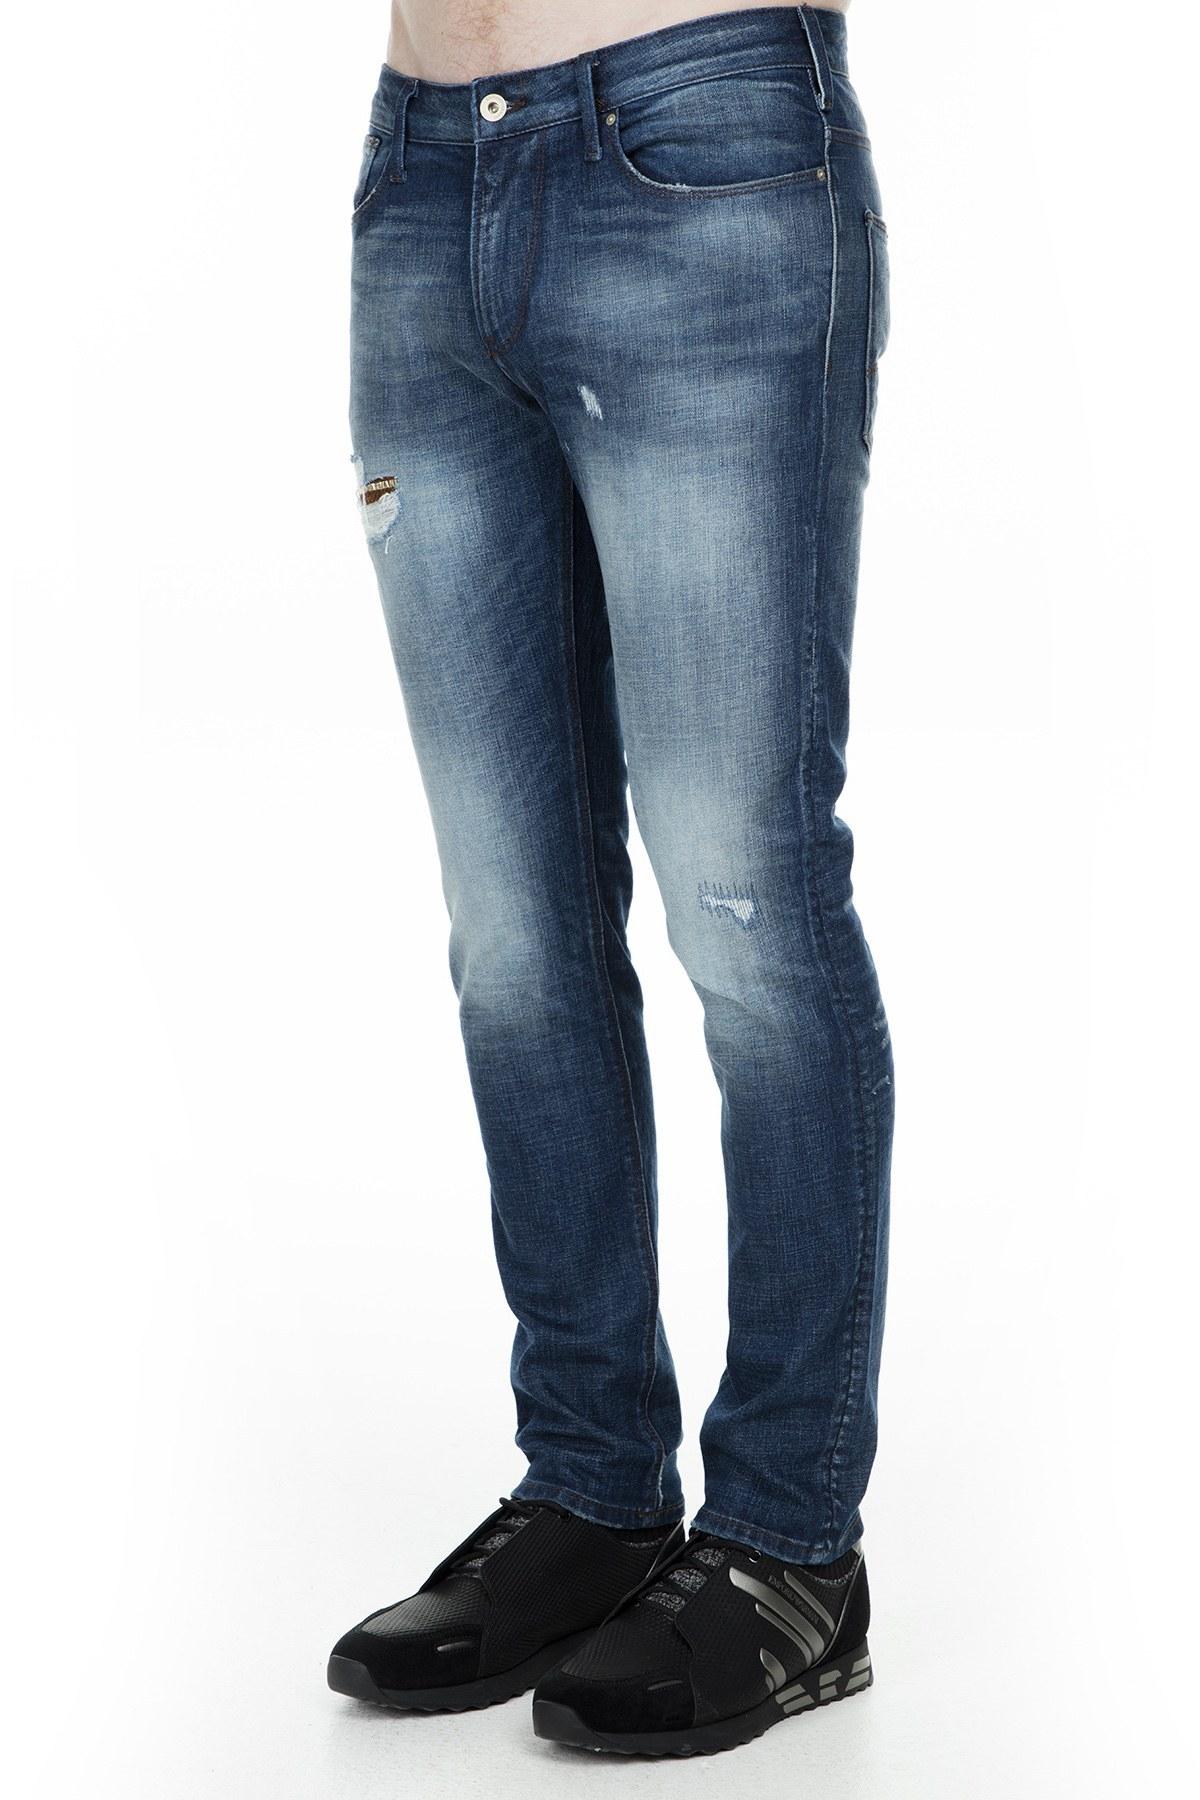 Emporio Armani J06 Jeans Erkek Kot Pantolon 6G1J06 1D6YZ 0941 LACİVERT